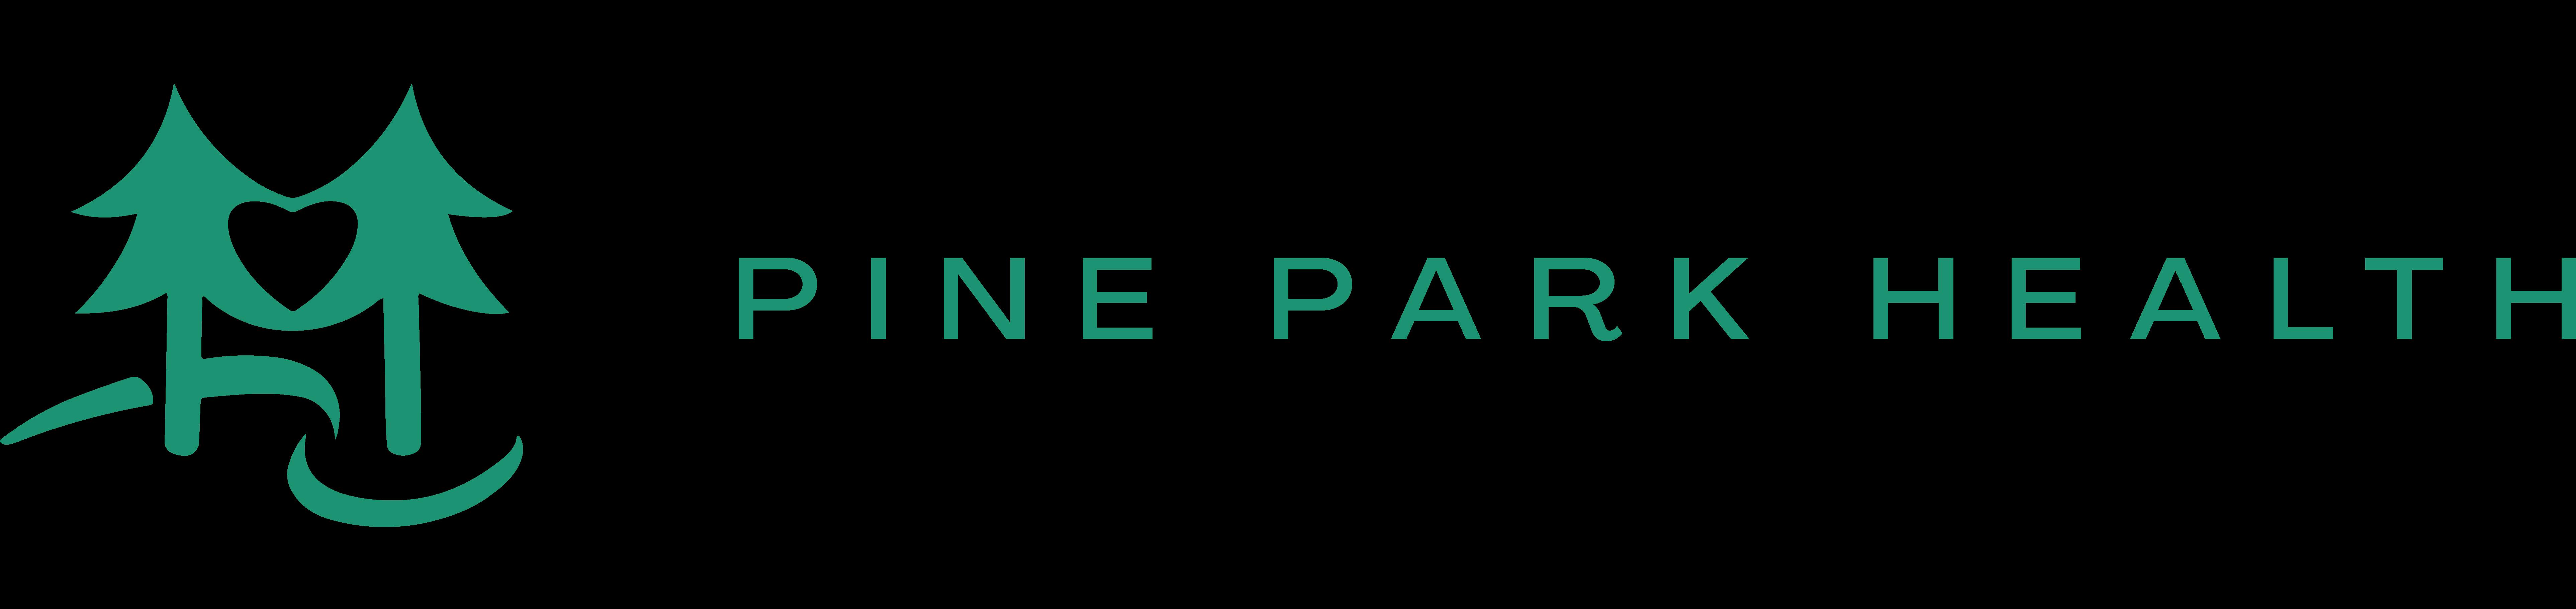 Pine Park Health logo